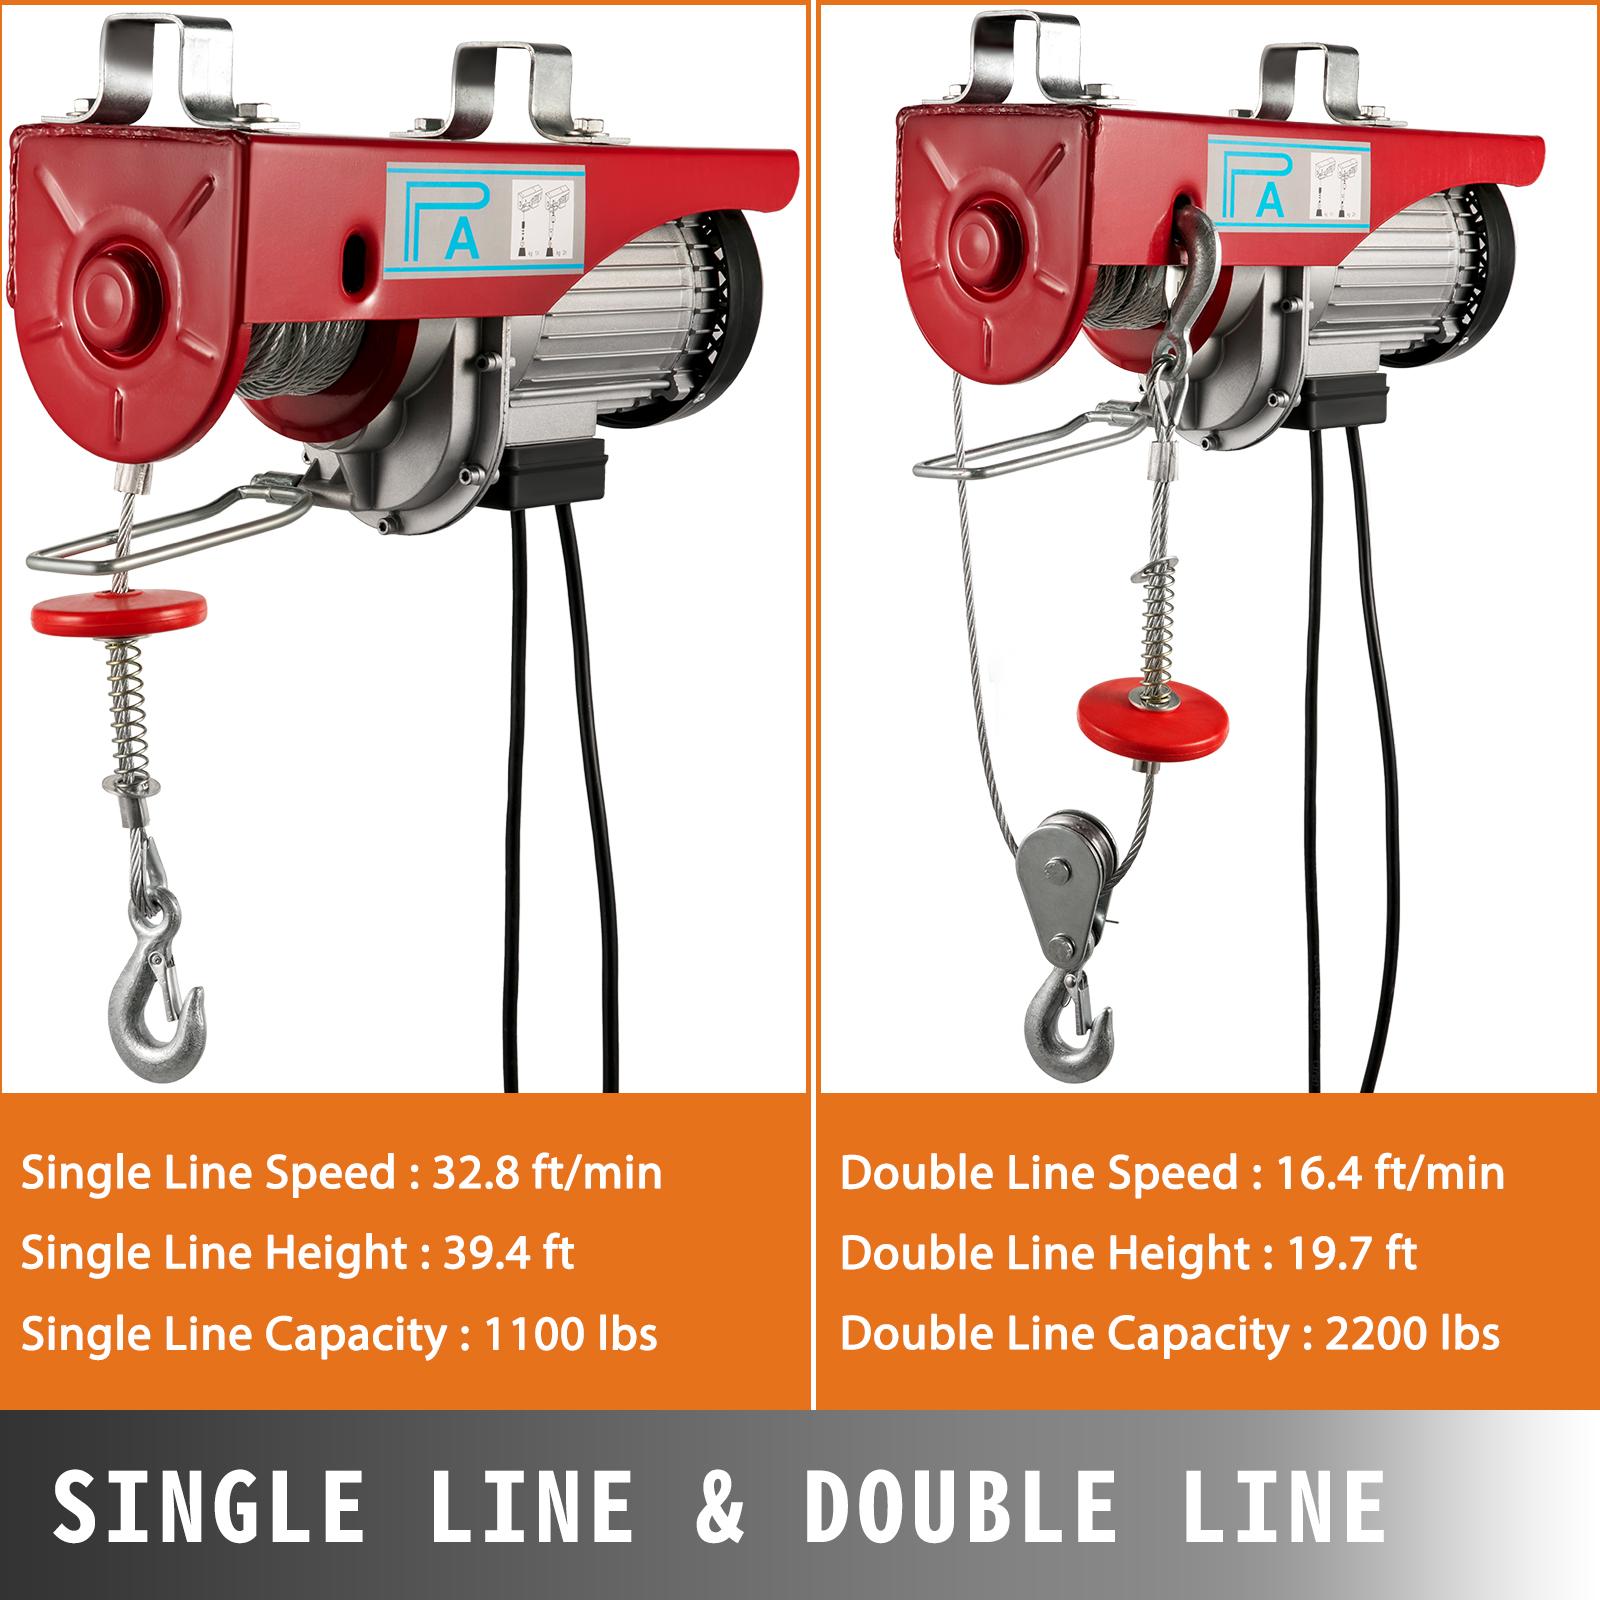 100kg-900kg-Electric-Hoist-Winch-Lifting-Engine-Crane-Cable-Lift-Hook-Garage miniature 74